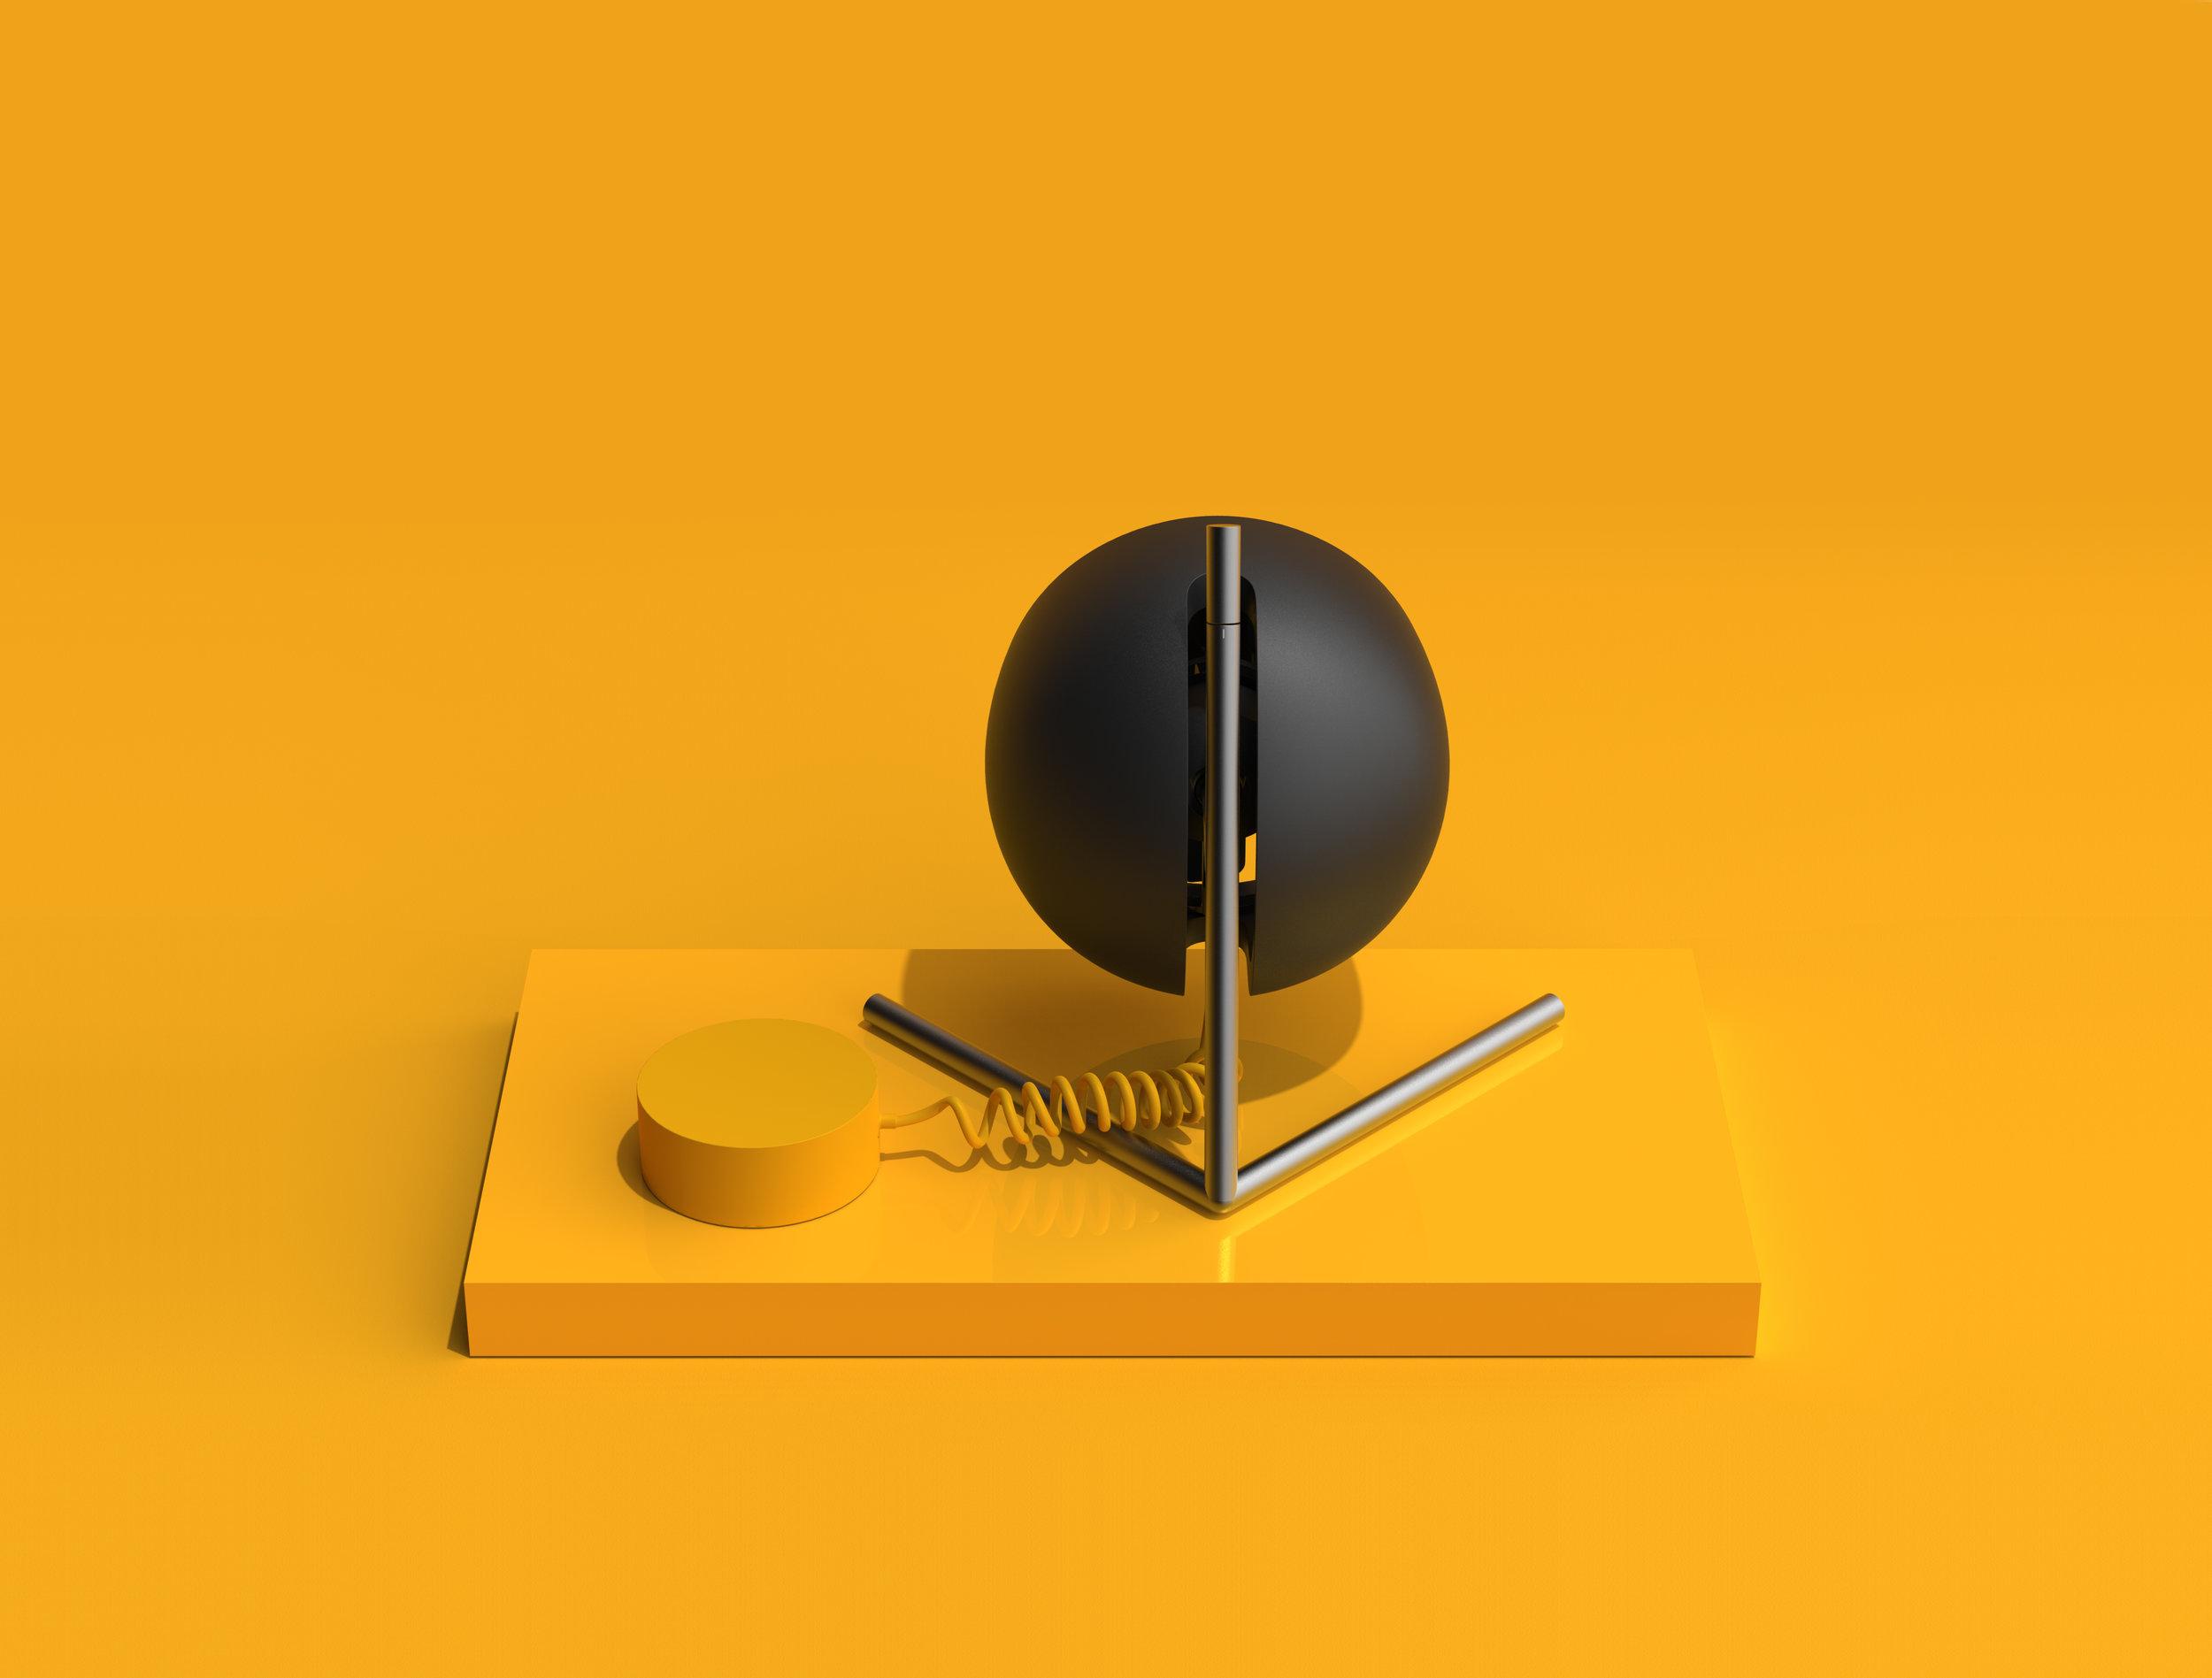 BlowingWithCS-Industrial-Design-Desk-Fan-Puck-Design-3.jpg